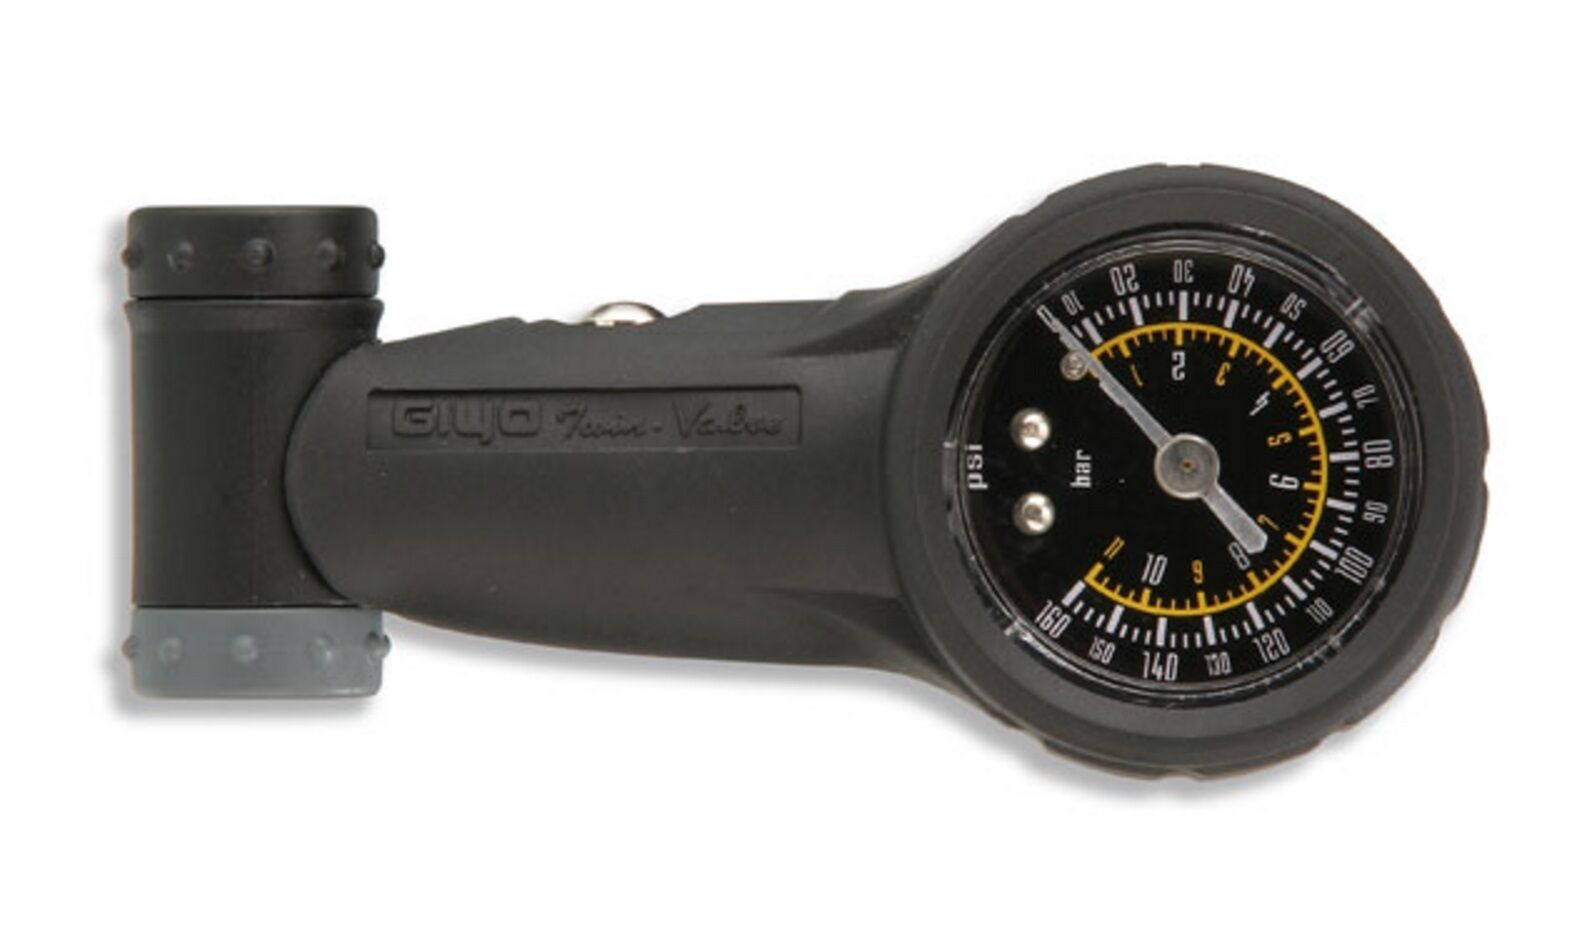 Displays PSI and Bar EyezOff Pencil Type Tire Pressure Gauge